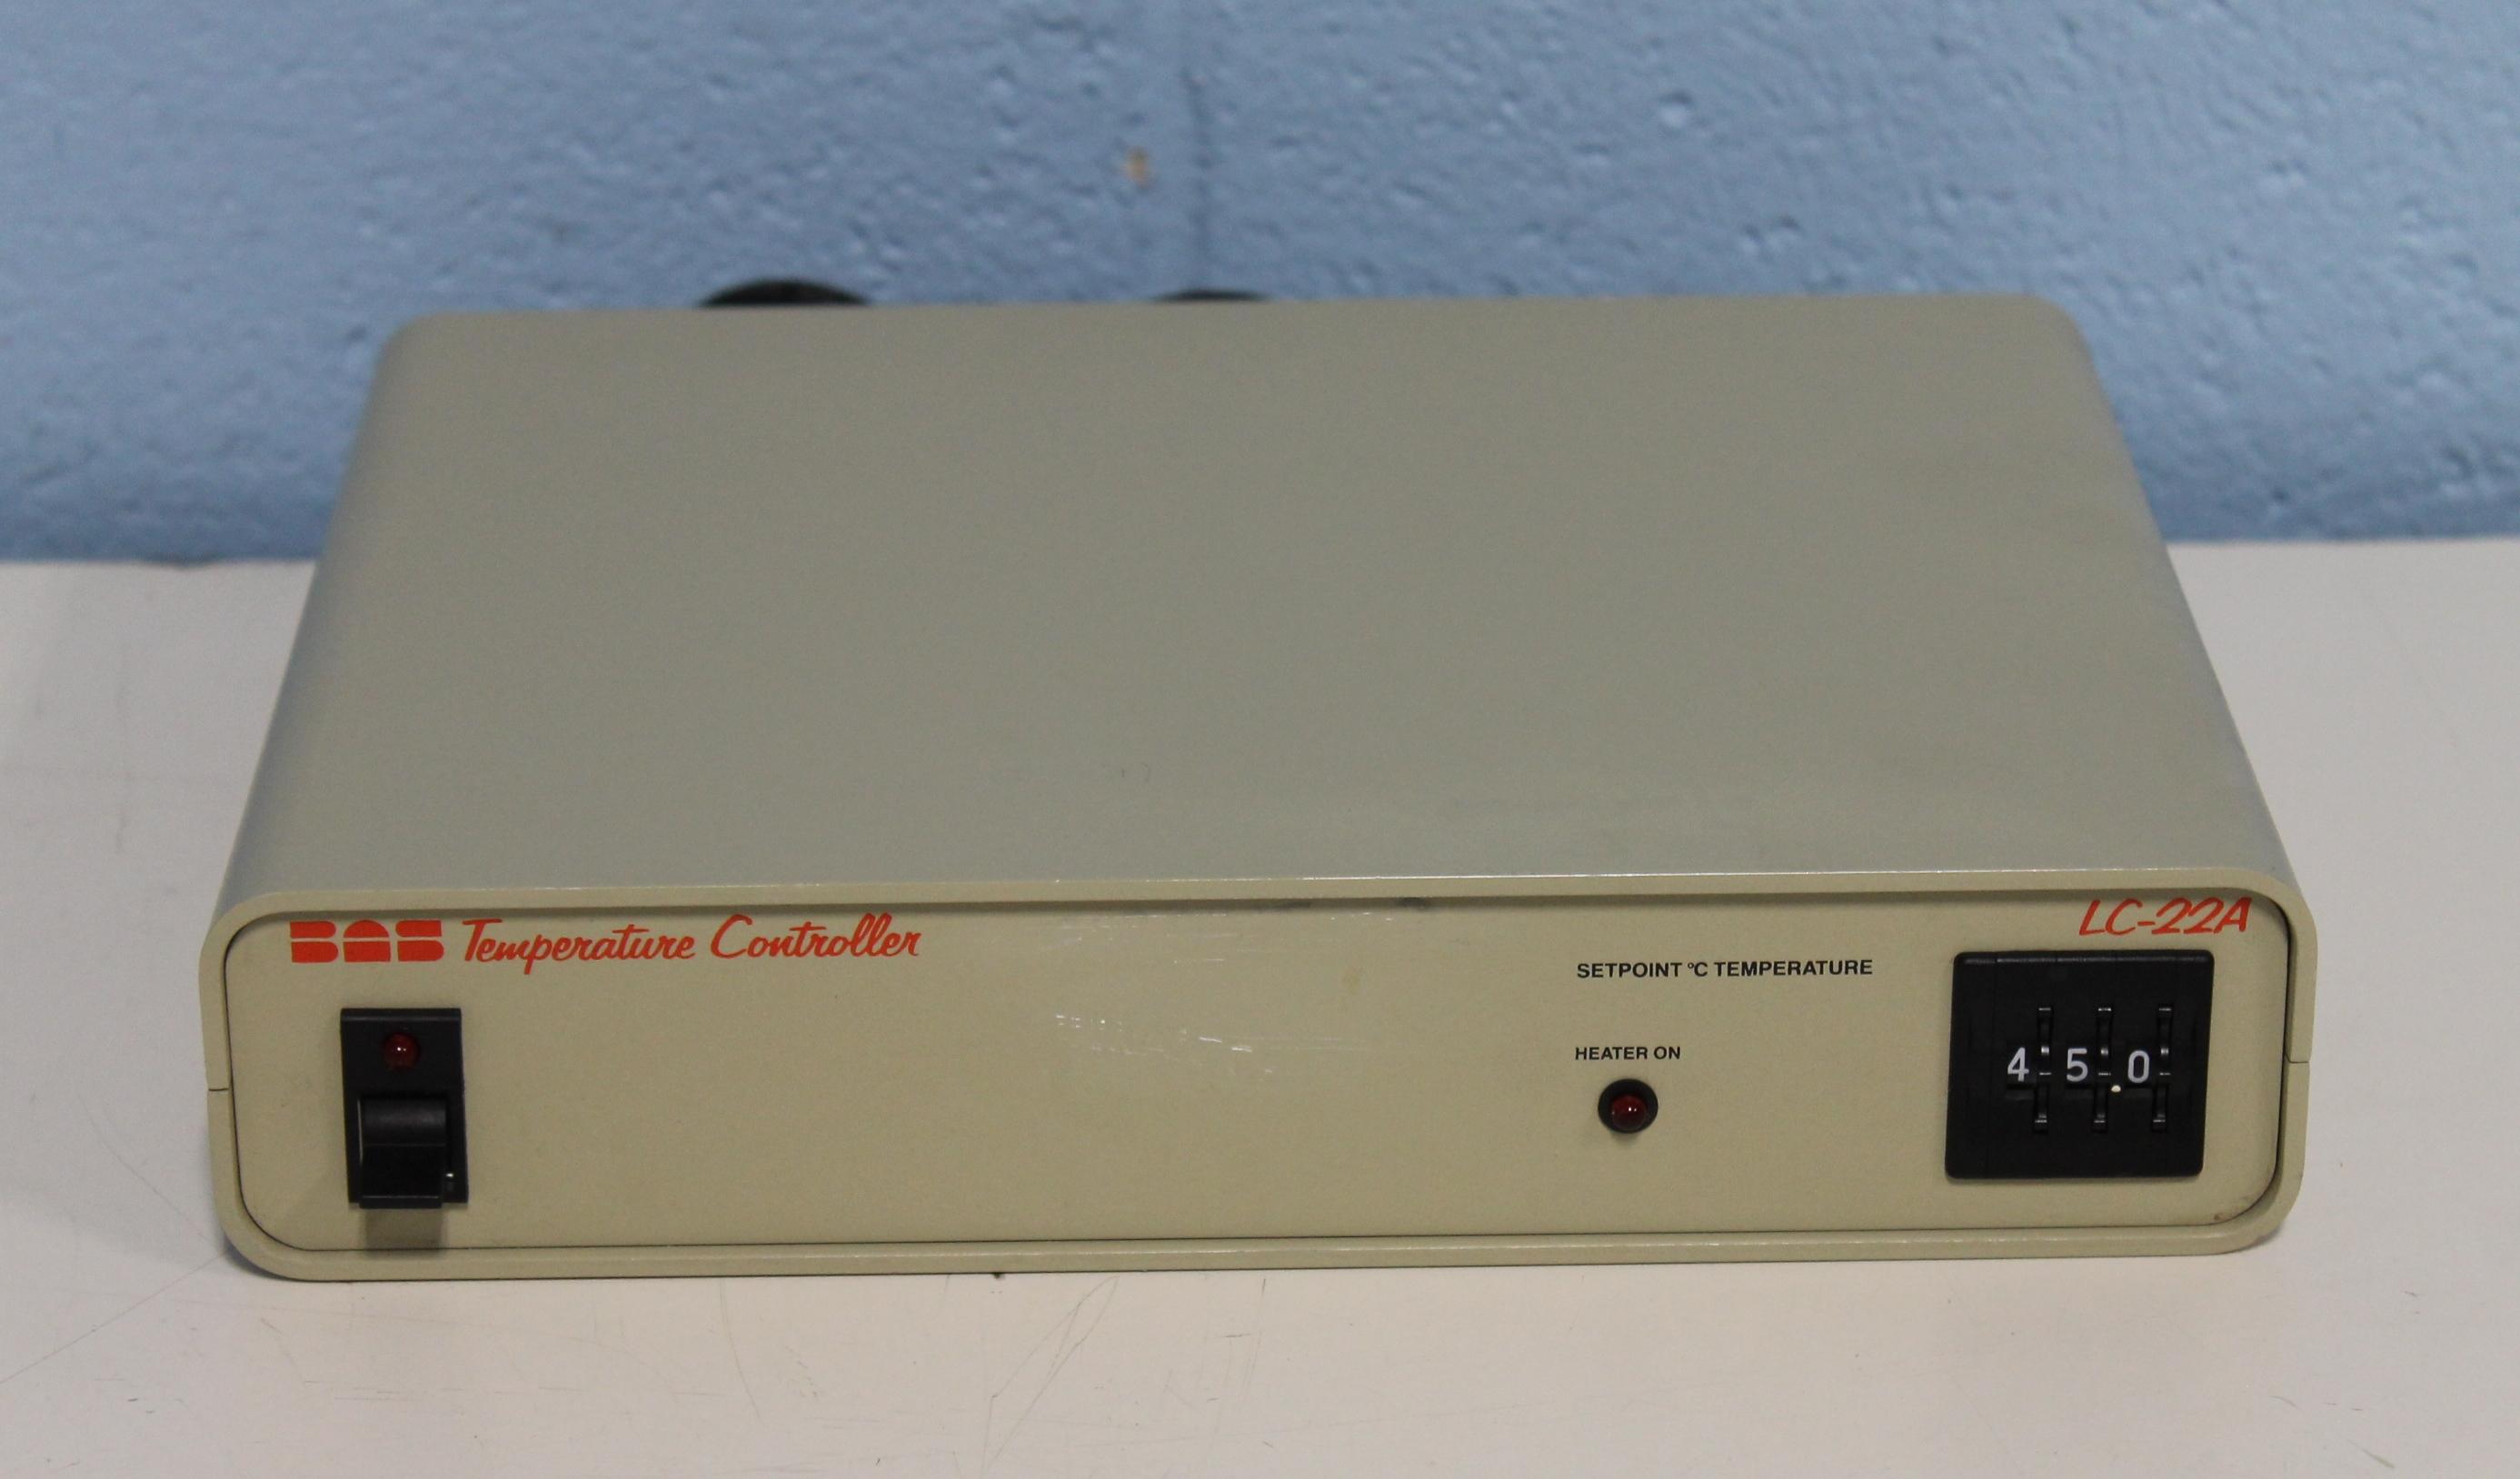 BAS LC-22A Temperature Controller  Image